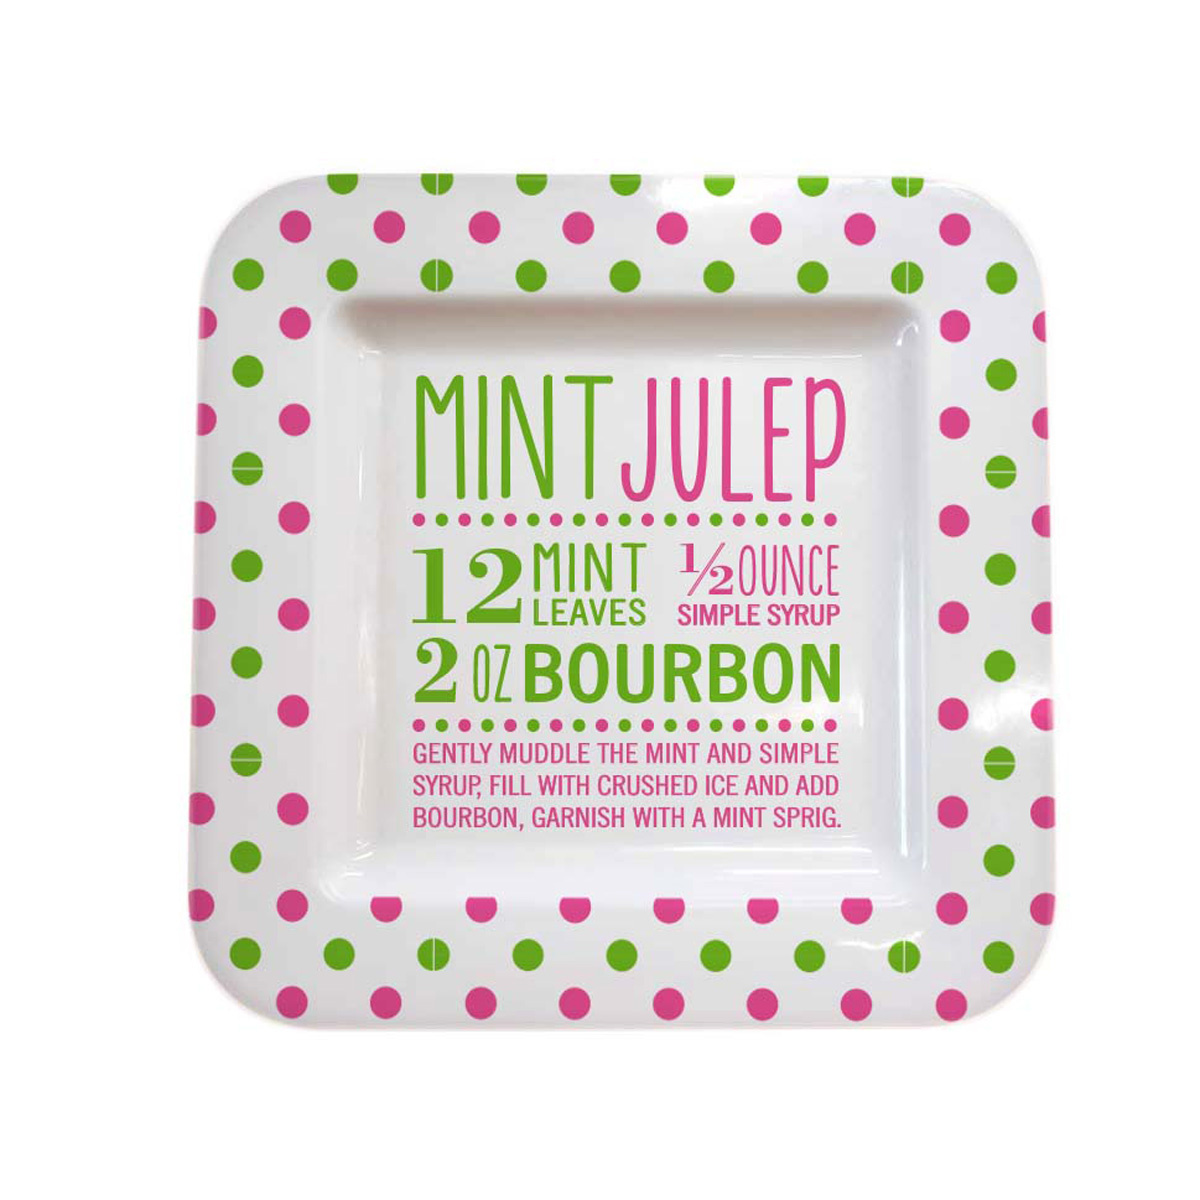 Mint Julep Melamine Square Platter